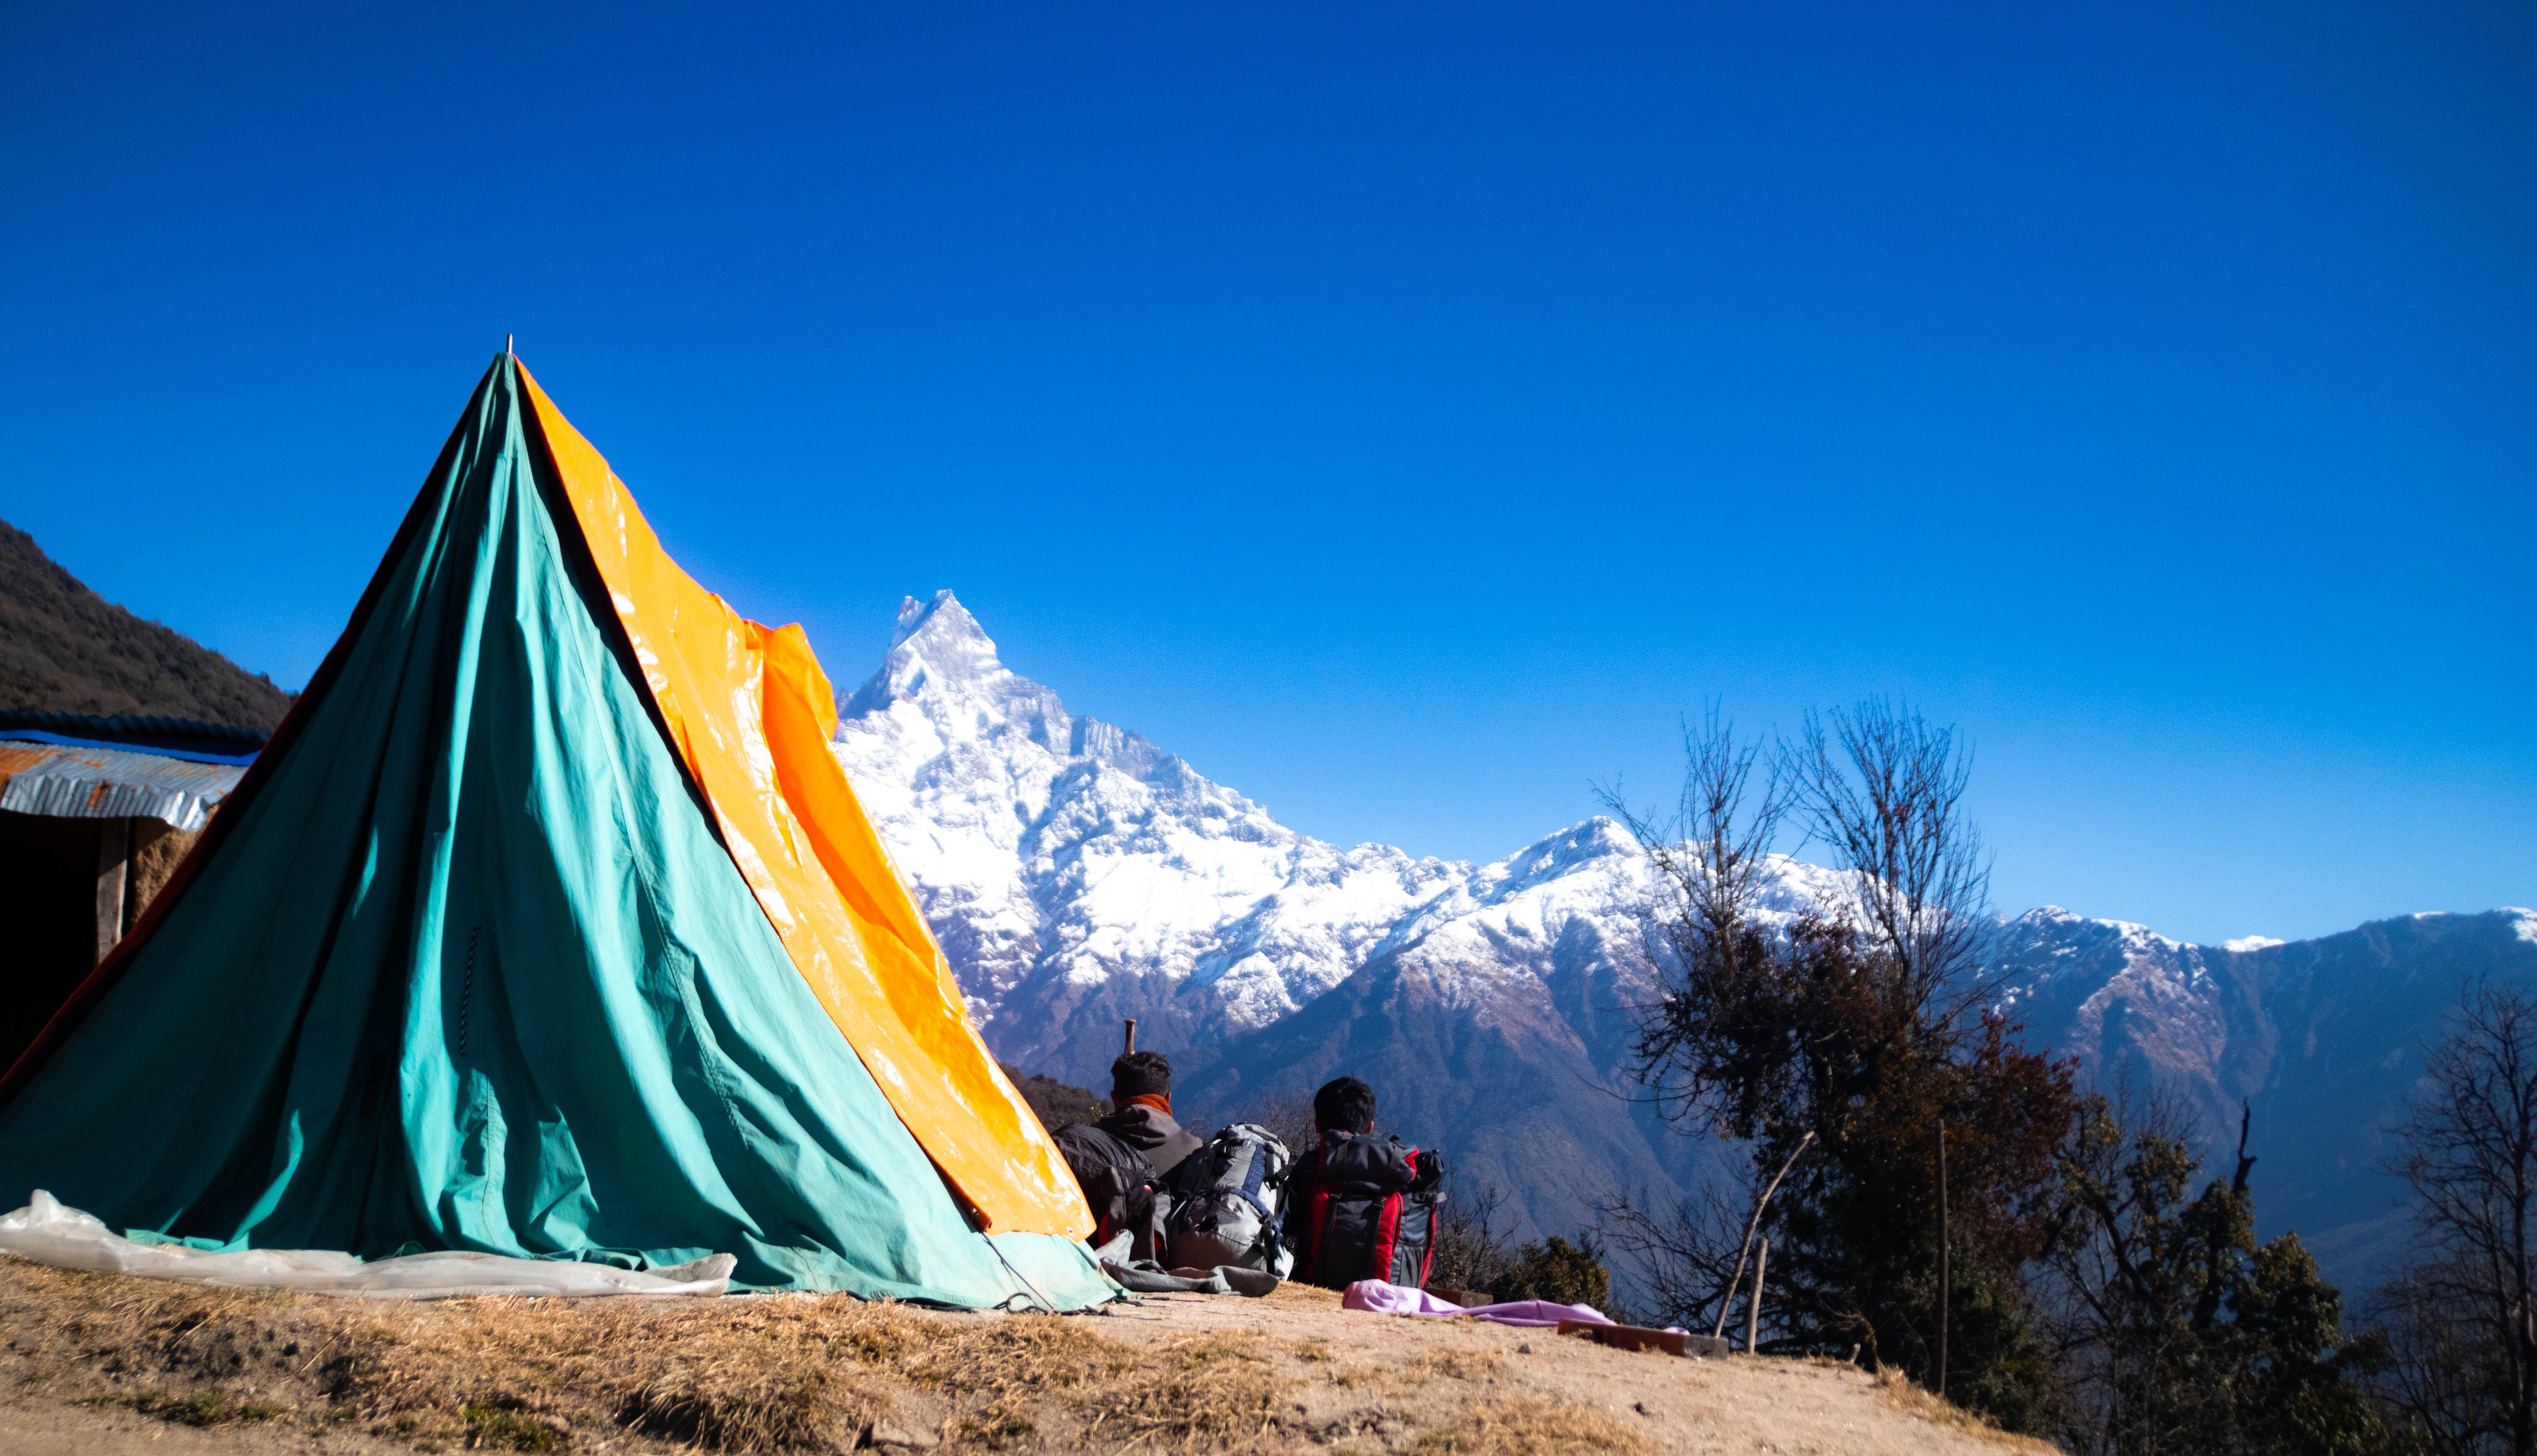 Free stock photo of #nature, landscape, trekking